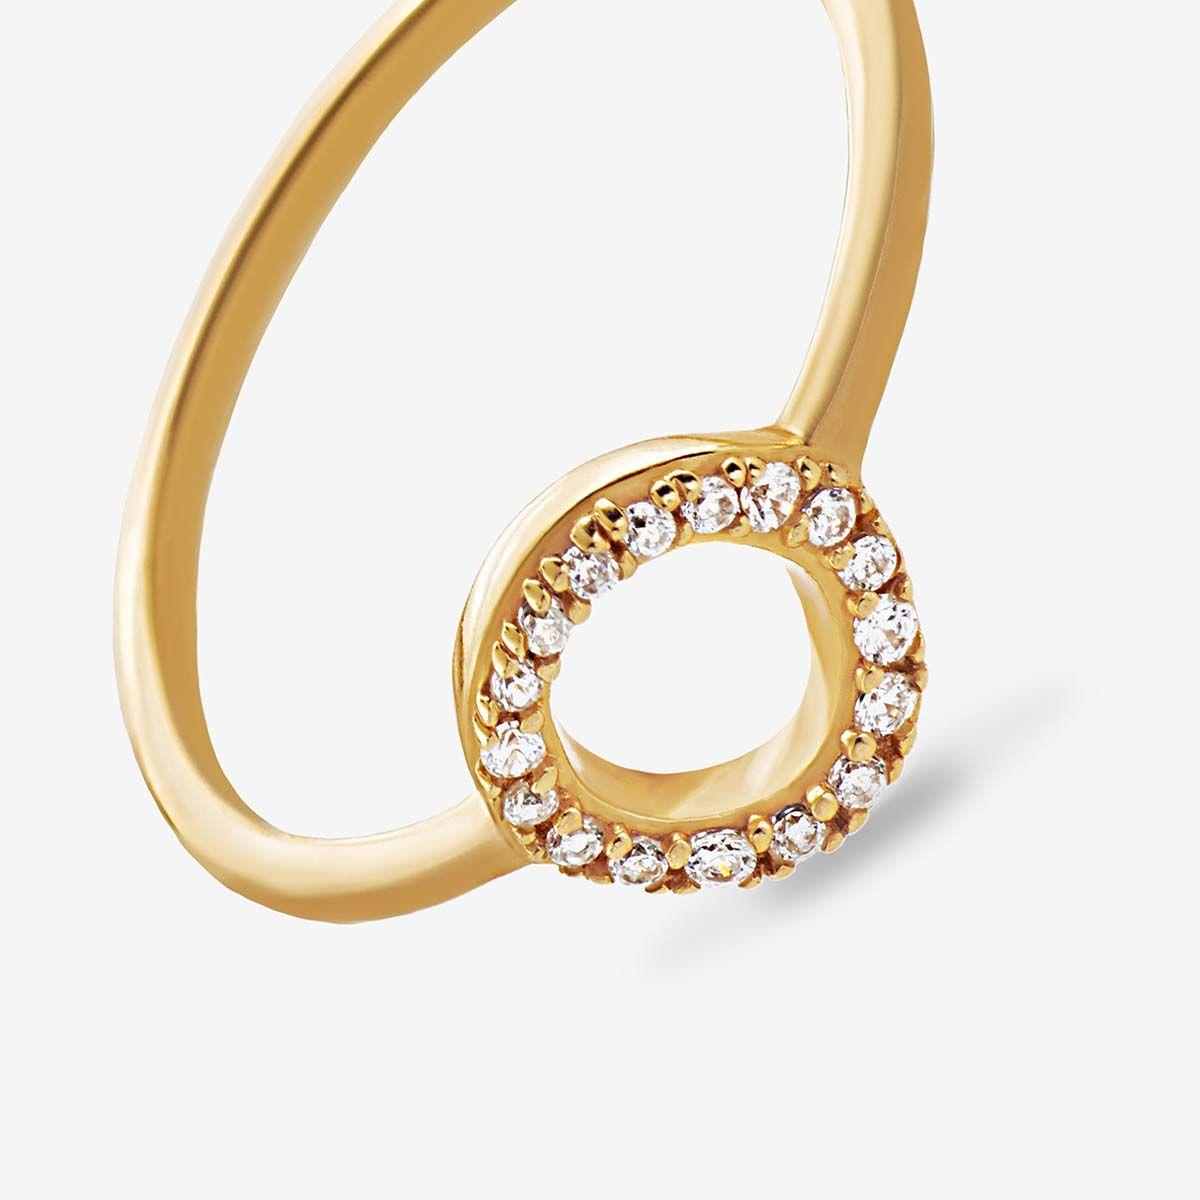 Suna - Ringe - 18k vergoldet